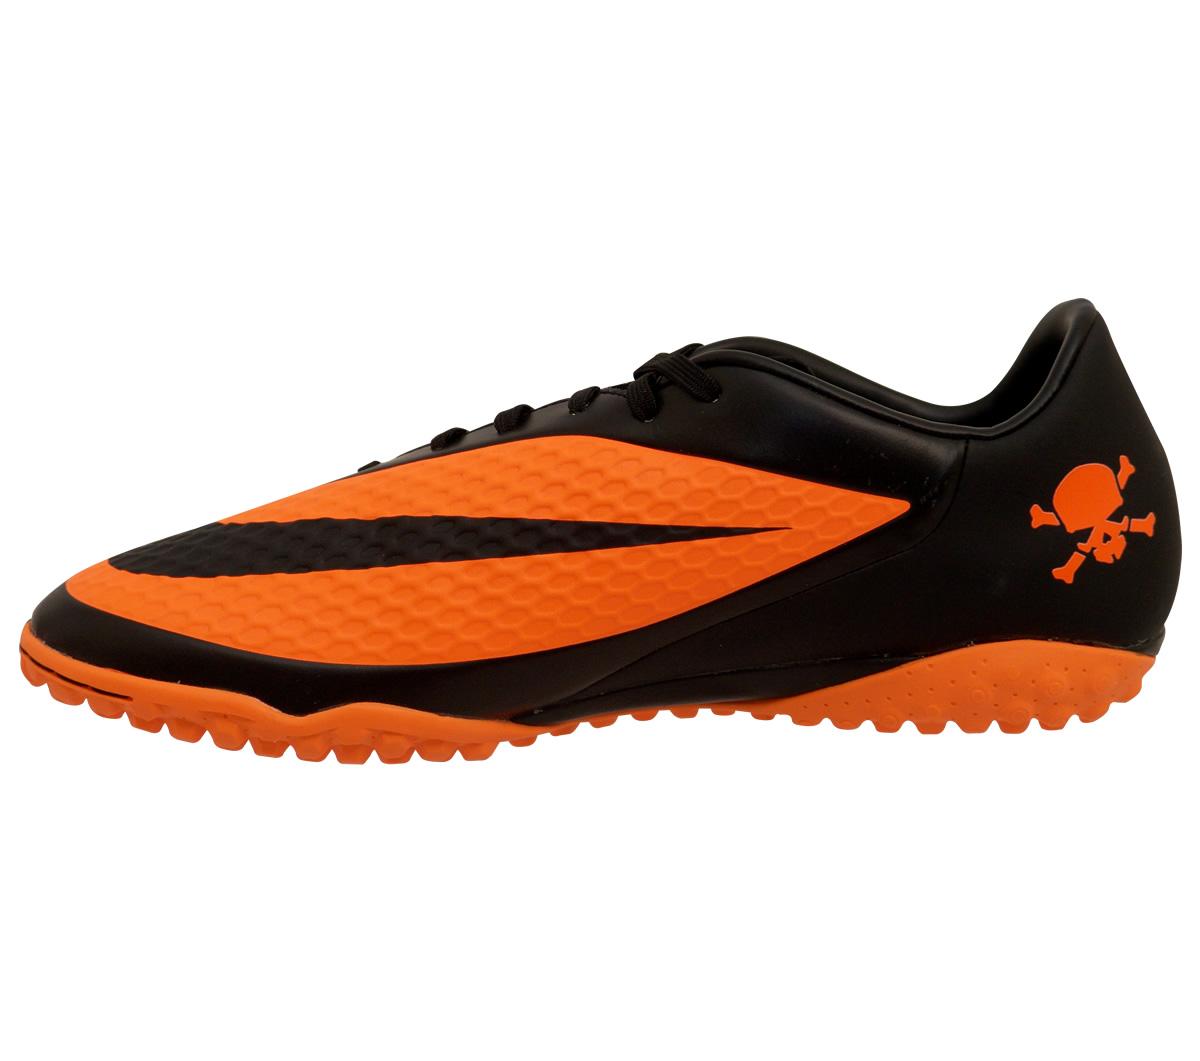 8f71c89cb52d8 ... shopping chuteira nike hypervenom phelon society laranja e preta 45163  304bd